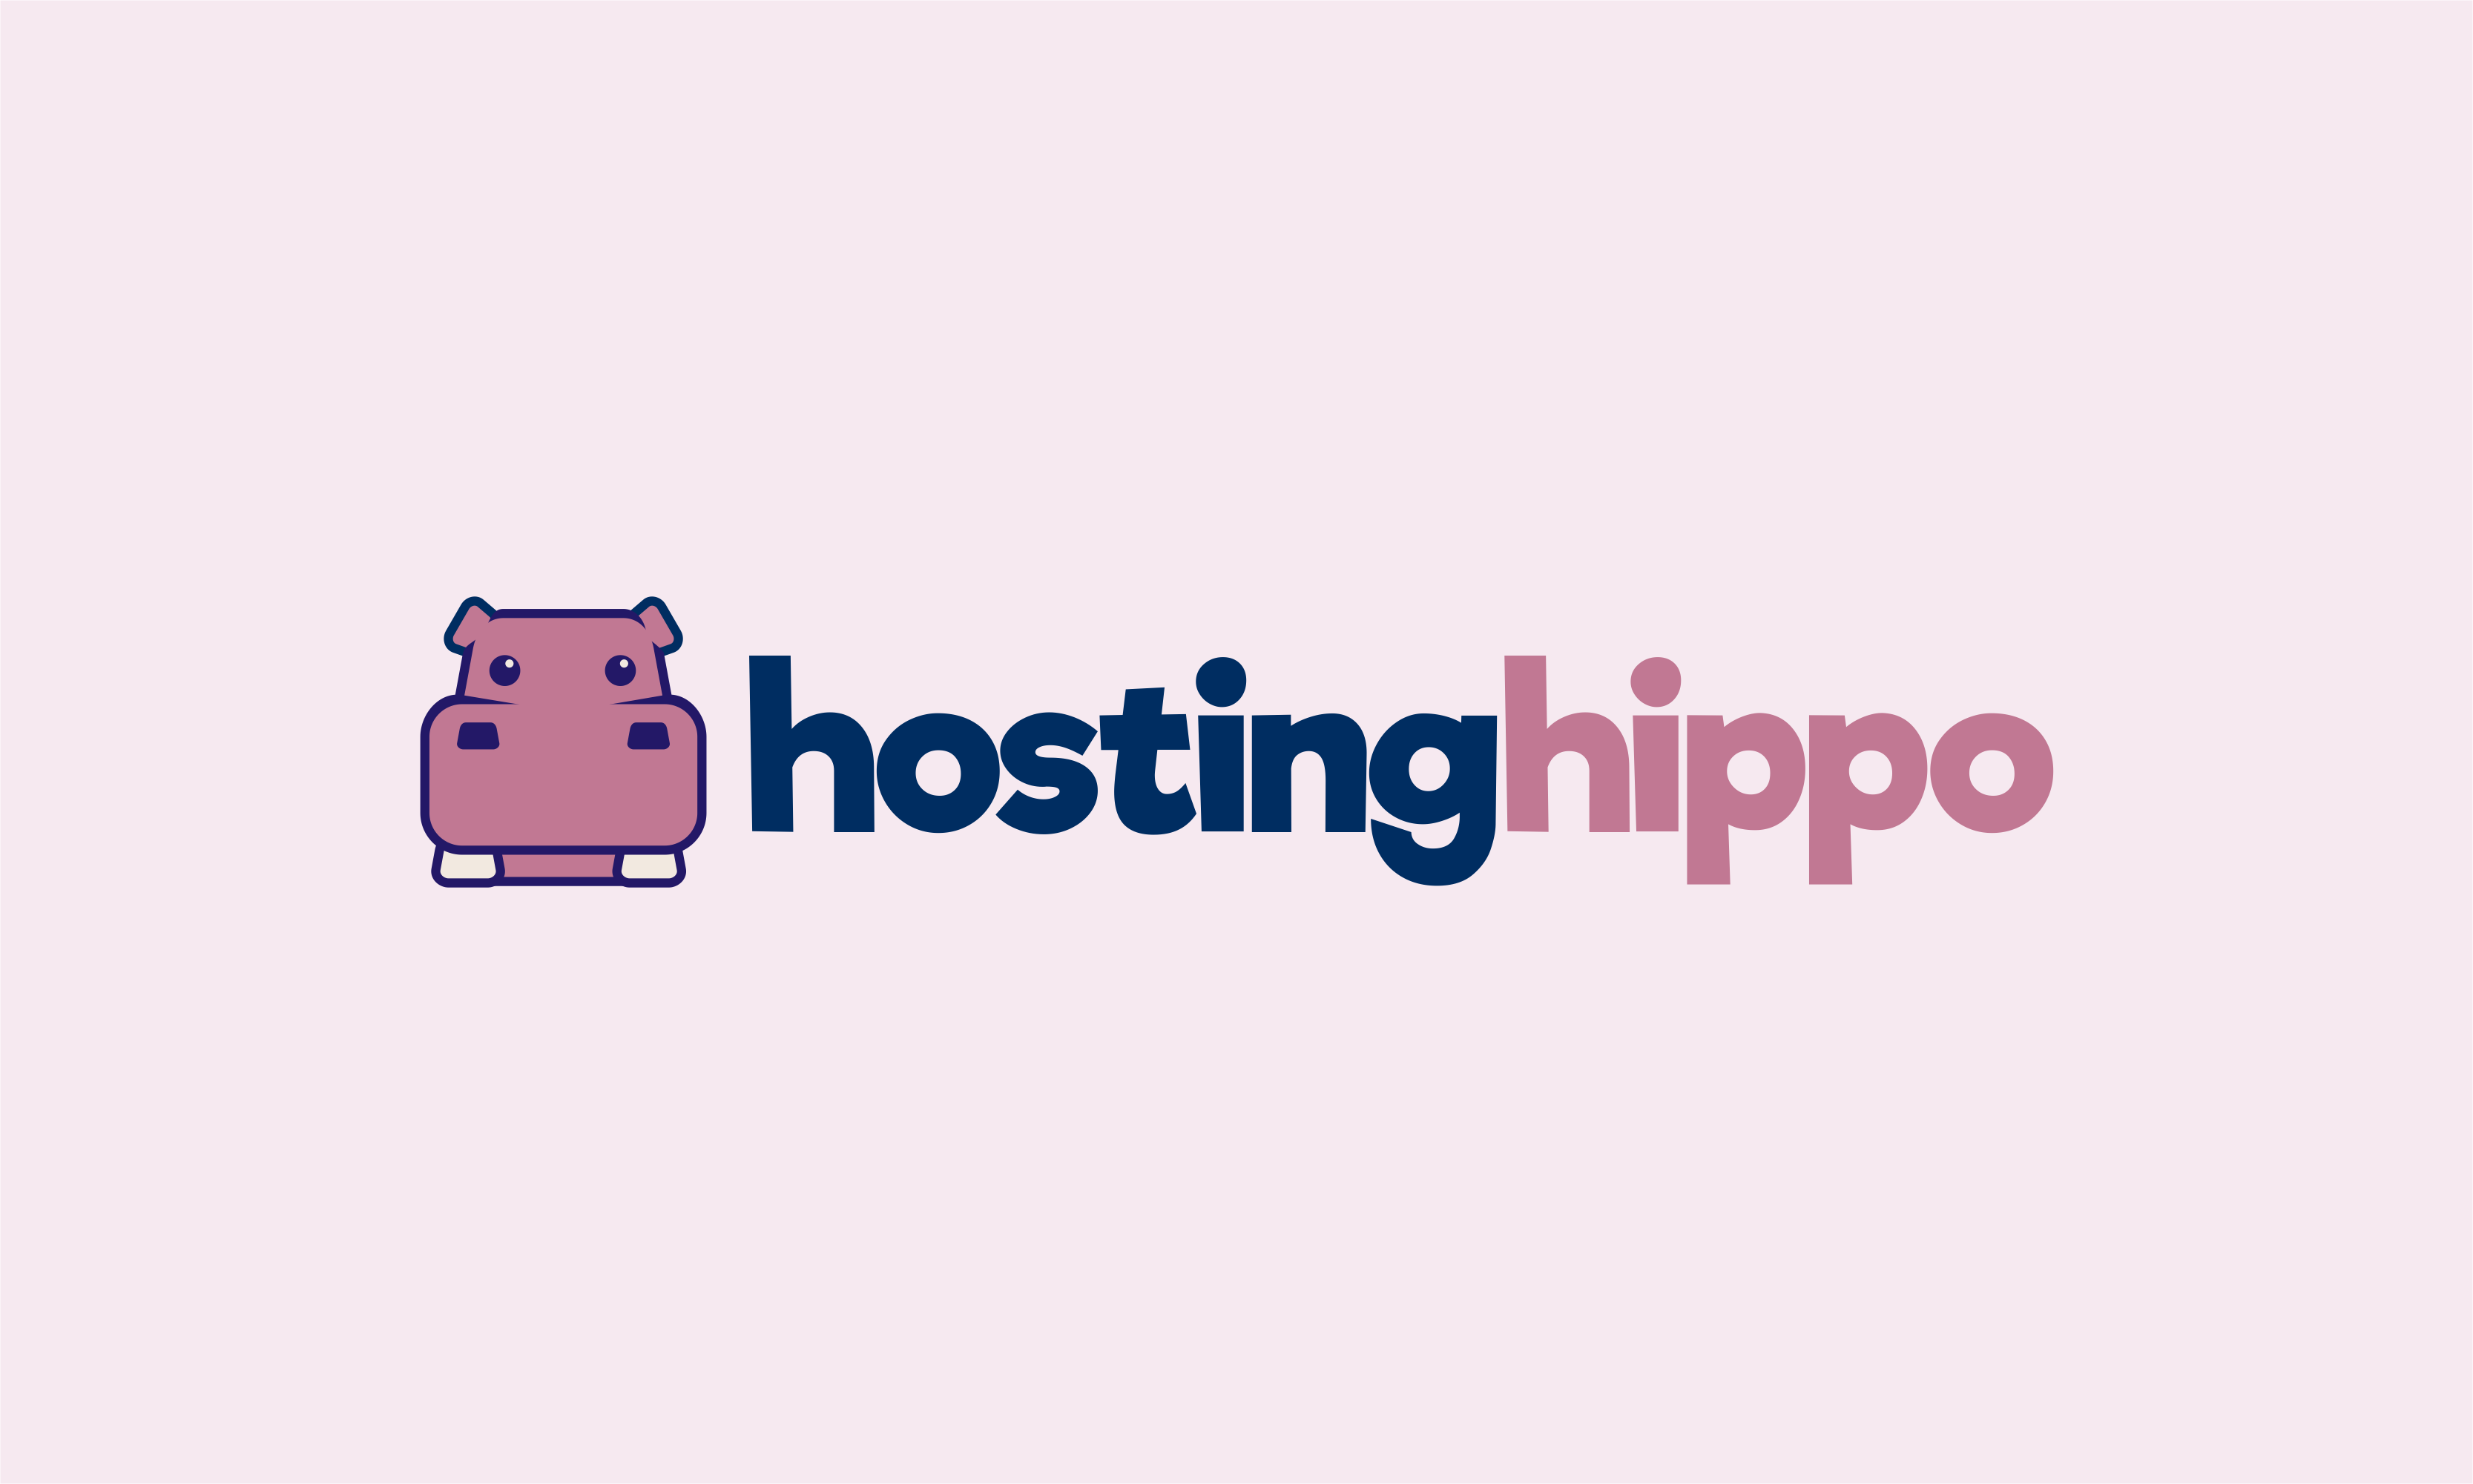 Hostinghippo